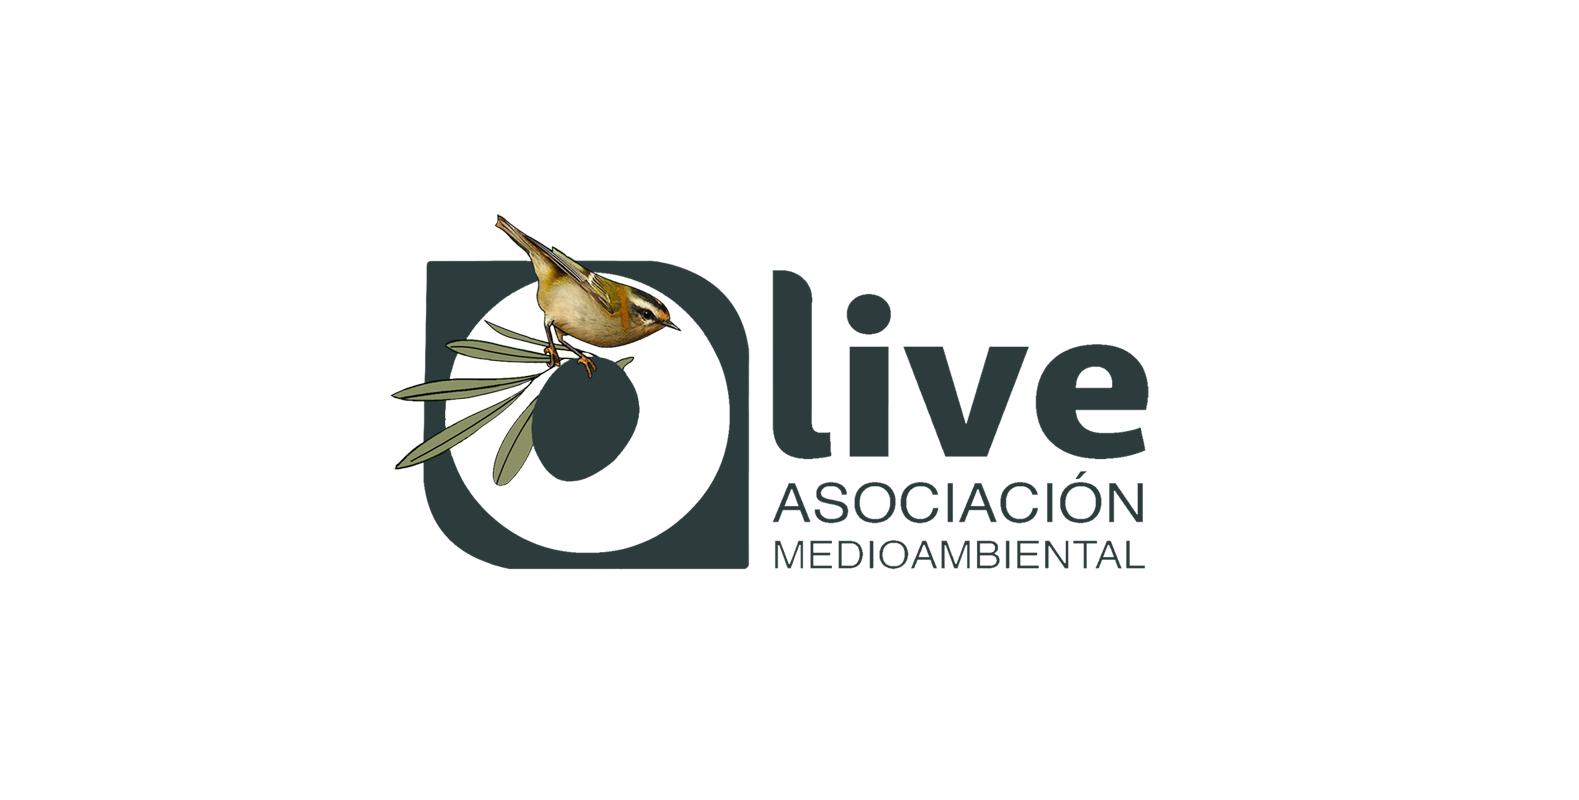 ASOCIACIÓN MEDIOAMBIENTAL O-LIVE